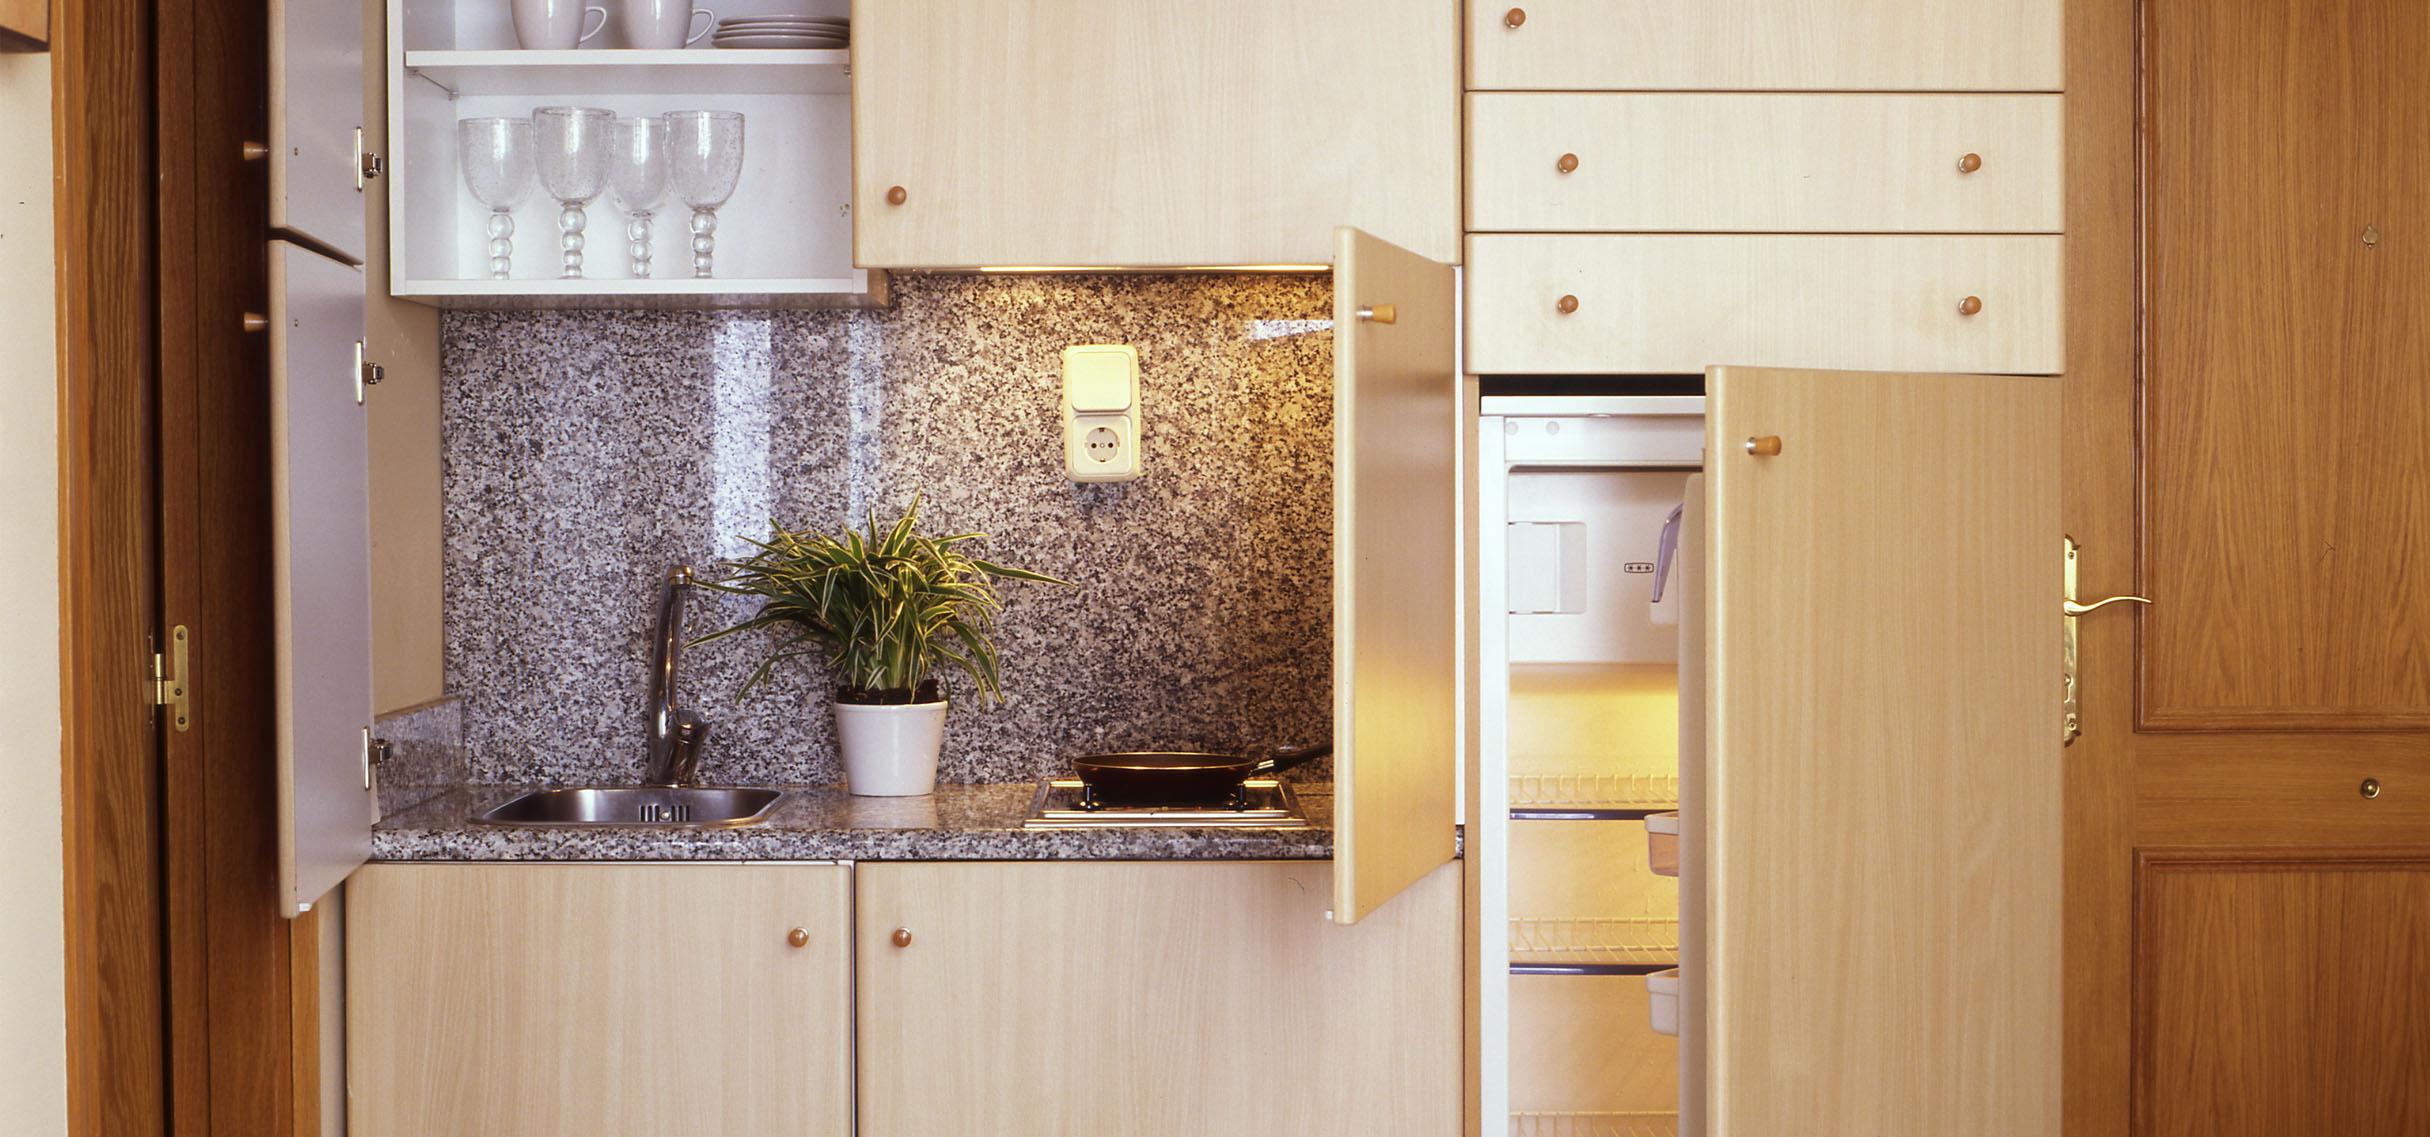 Alquiler temporal en madrid apartamento 1 habitaci n for Alquiler pisos vacios madrid